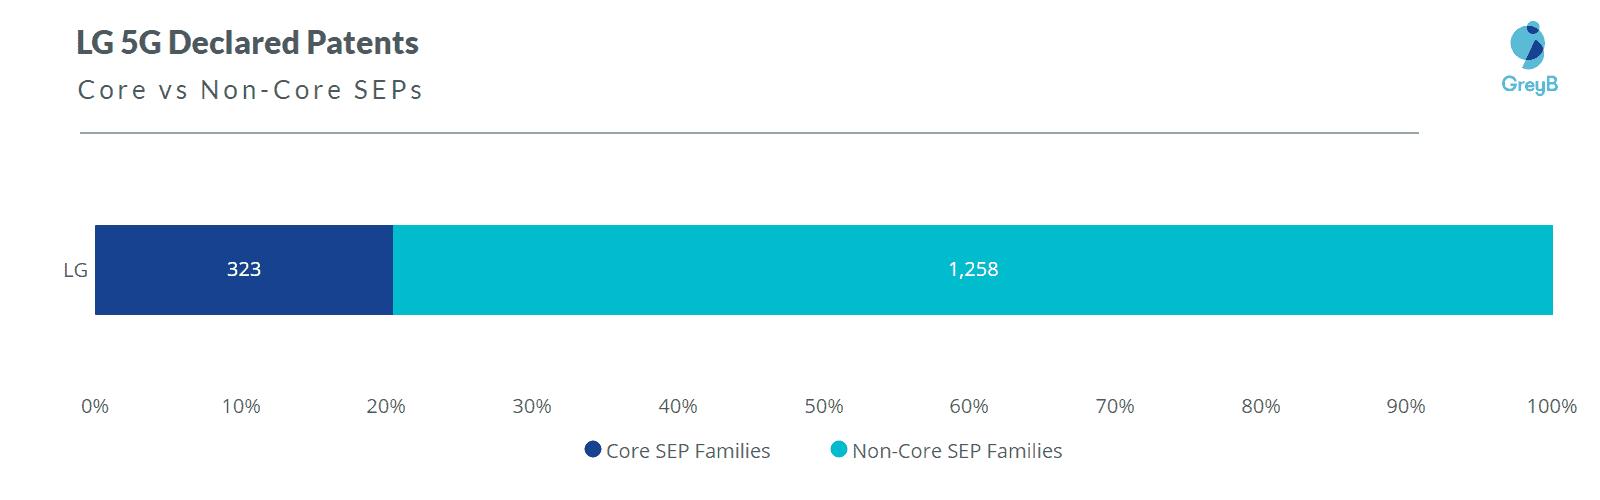 LG 5G Core SEPs